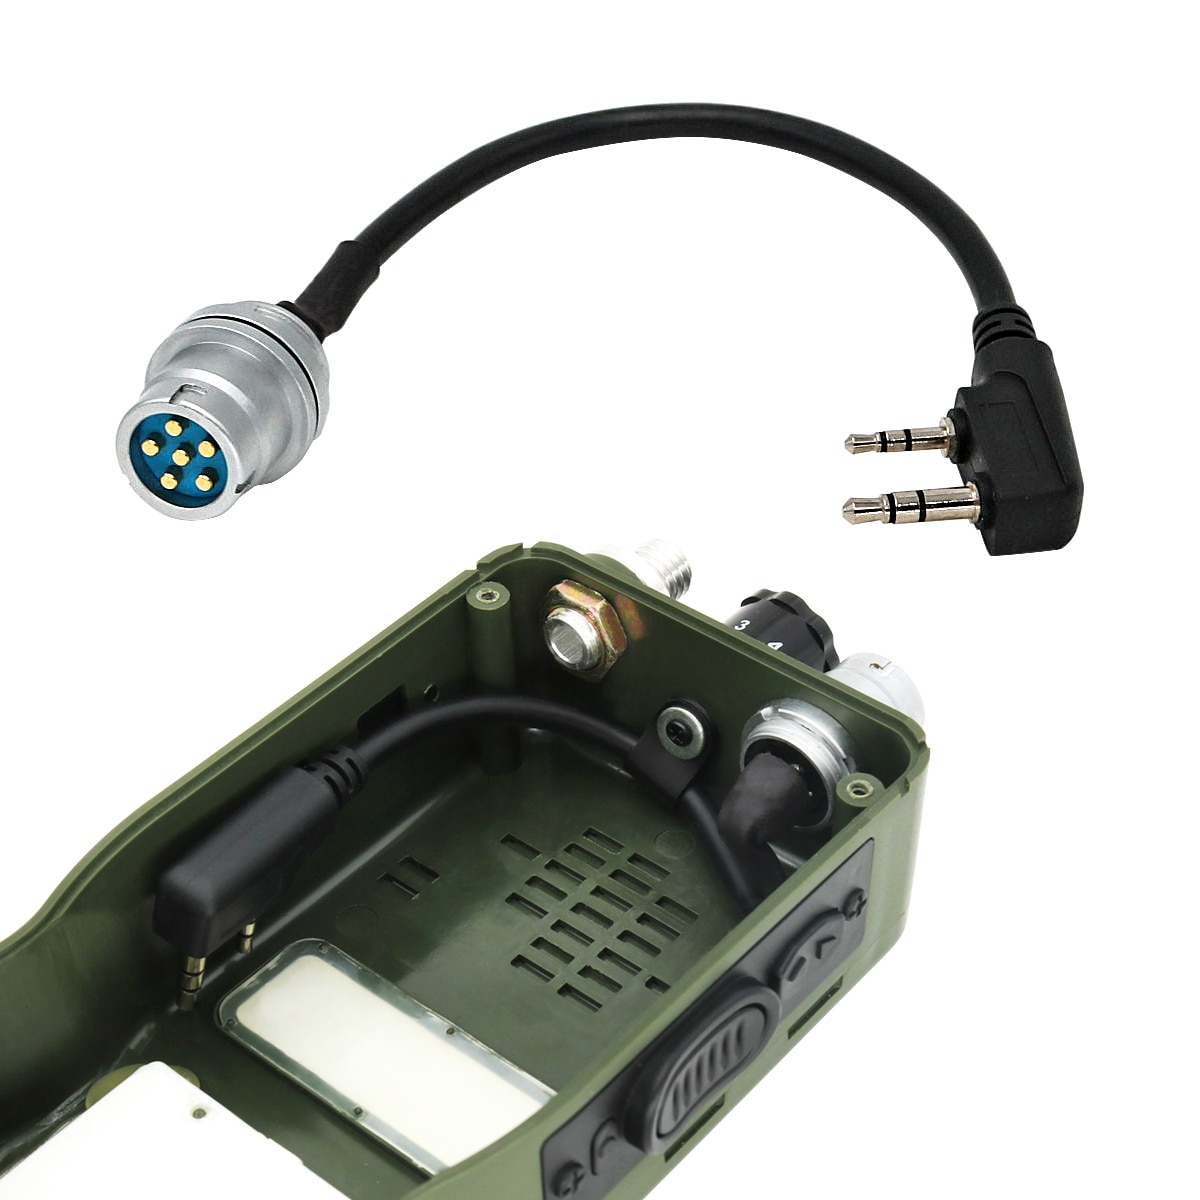 Tactical Headset Ptt Peltor 6pin Ptt + U-283 /U 6 Pin Plug Turn To Kenwood Walkie-talkie Connector for PRC 152 PRC 148 Dummy Cas enlarge